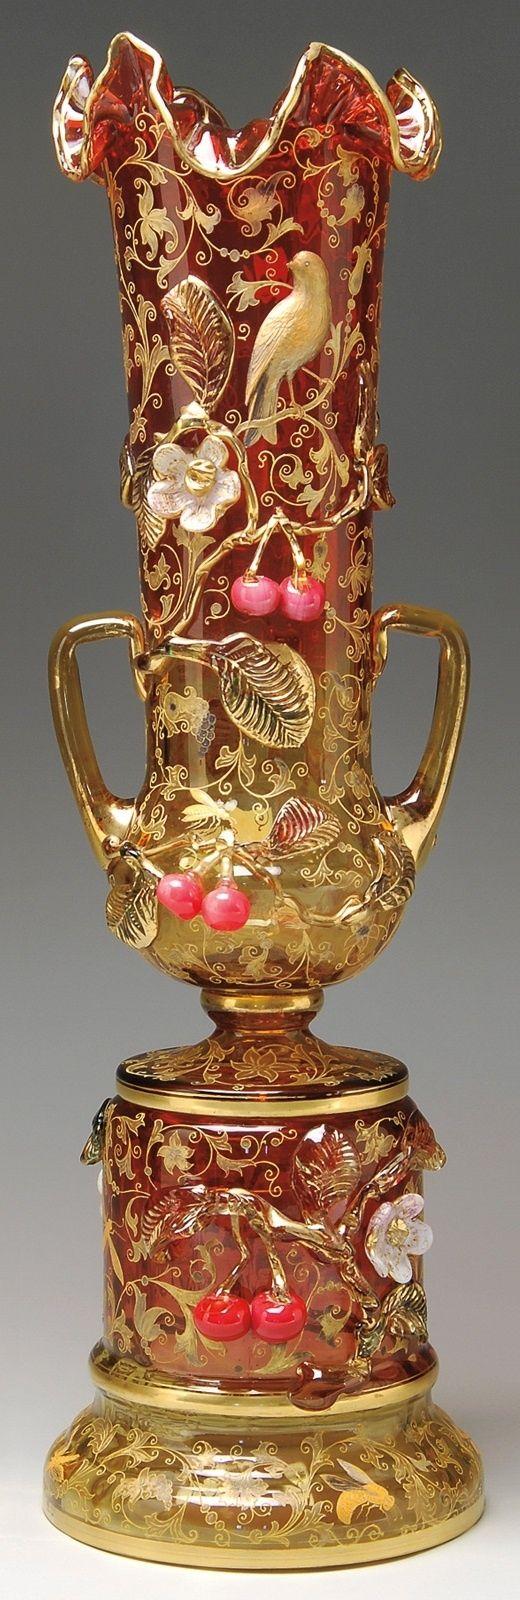 Ornate Moser bohemian glass vase, late 19th century